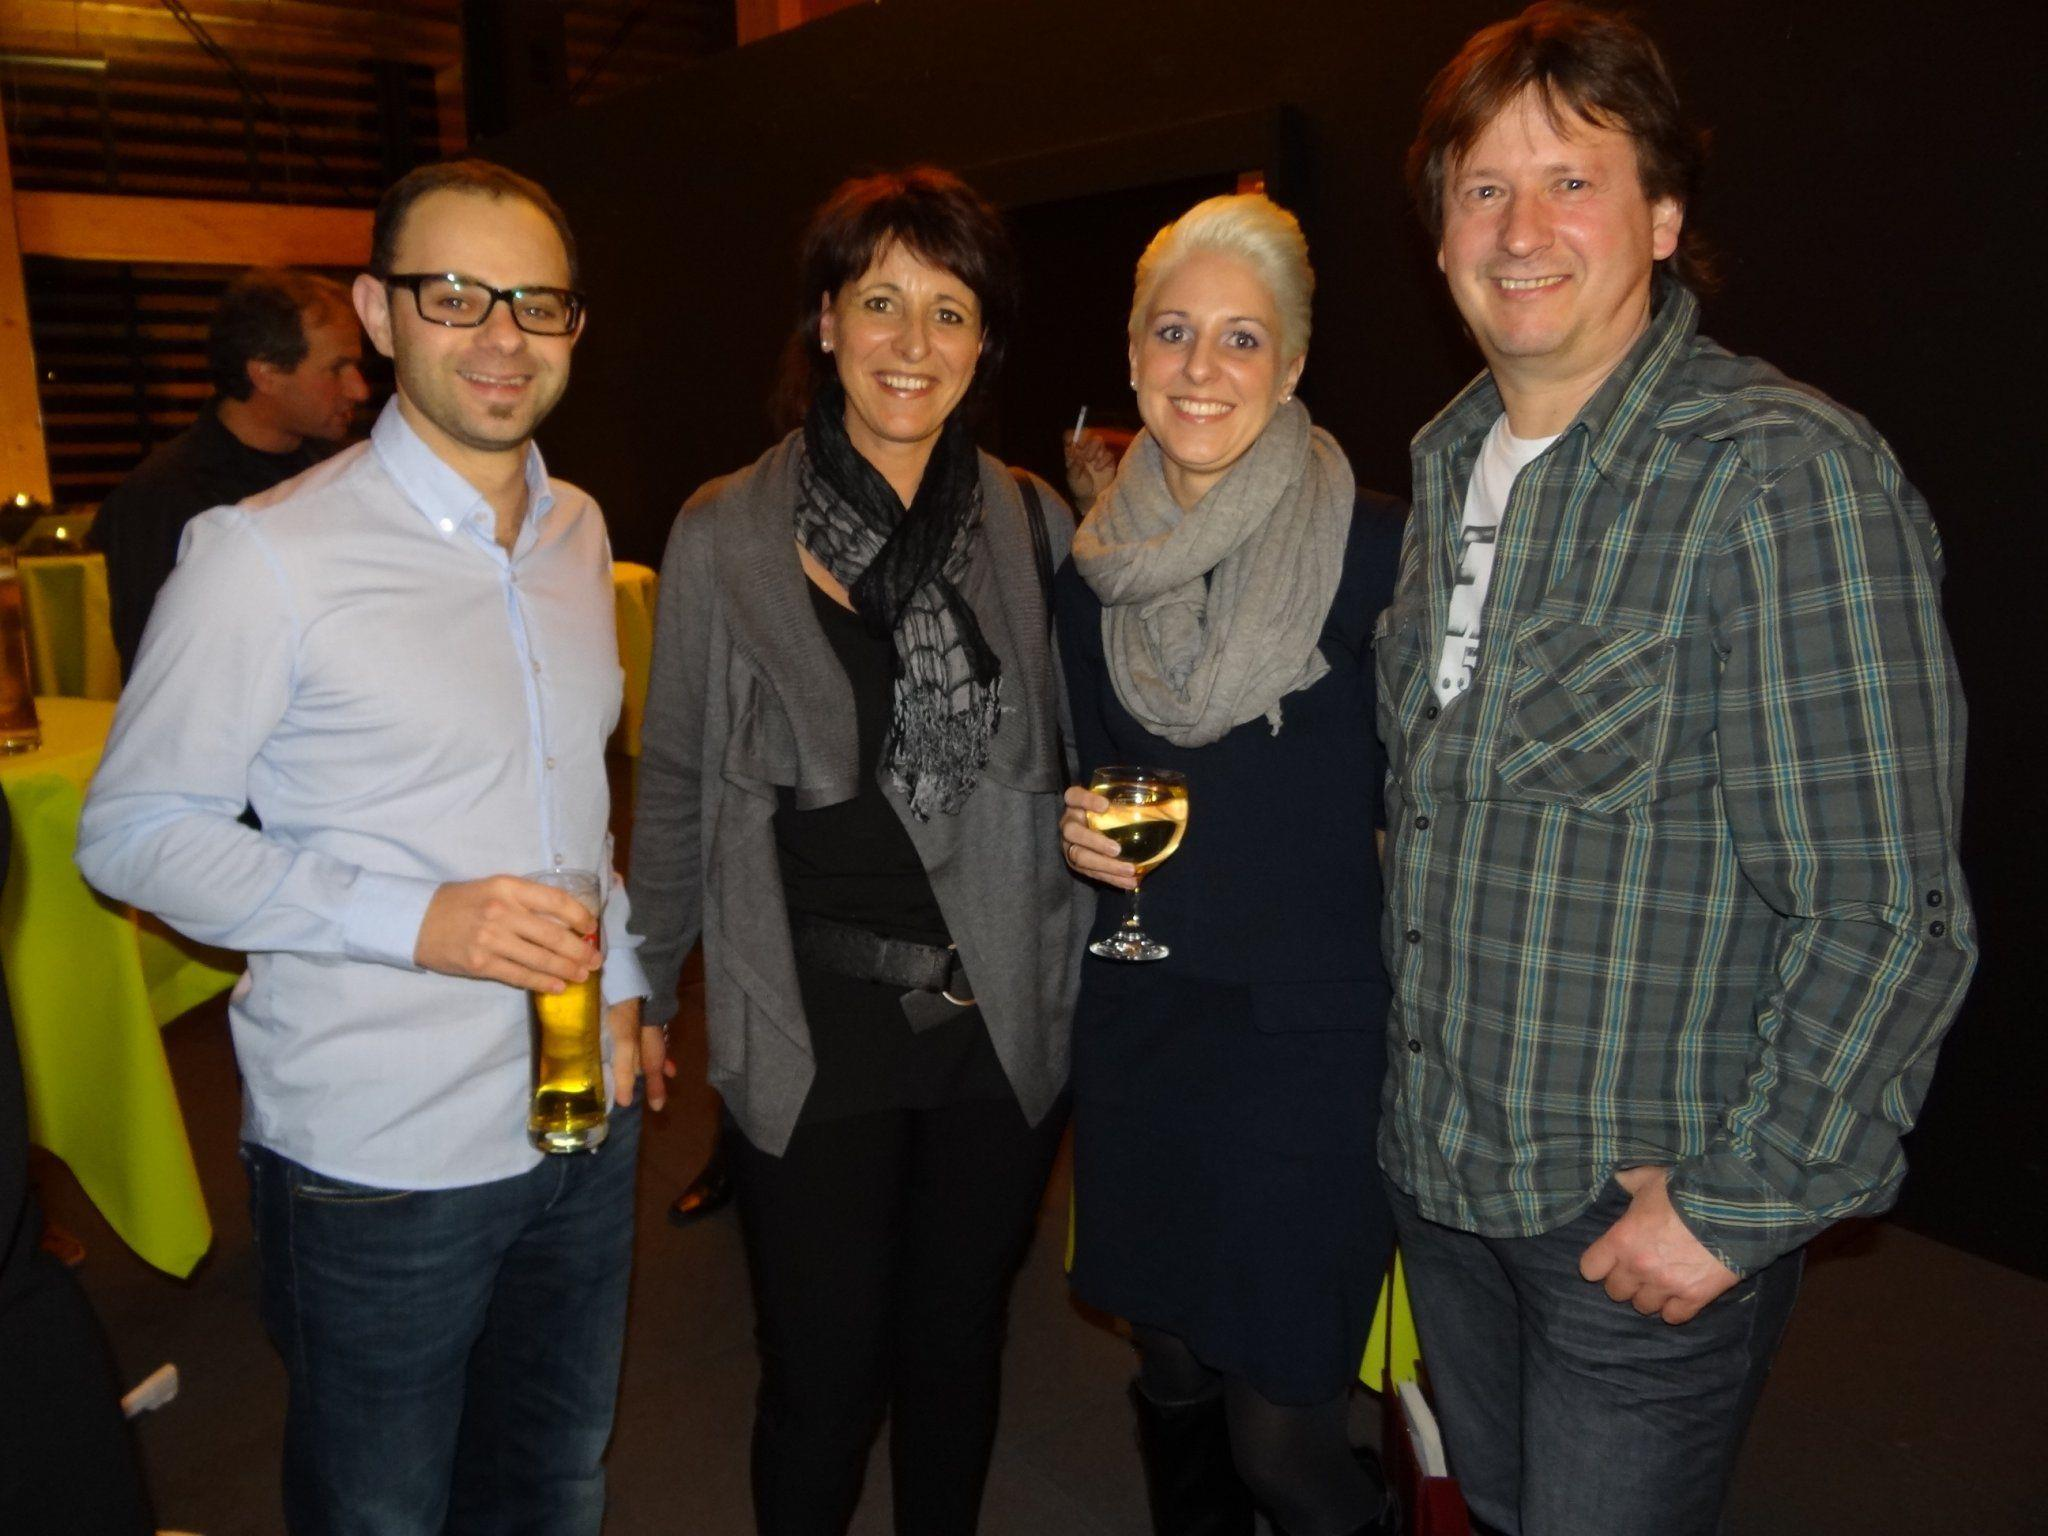 (v.l.) Jürgen, Andrea, Andrea & Mikel genossen einen tolle Herbstfeier im Mösle